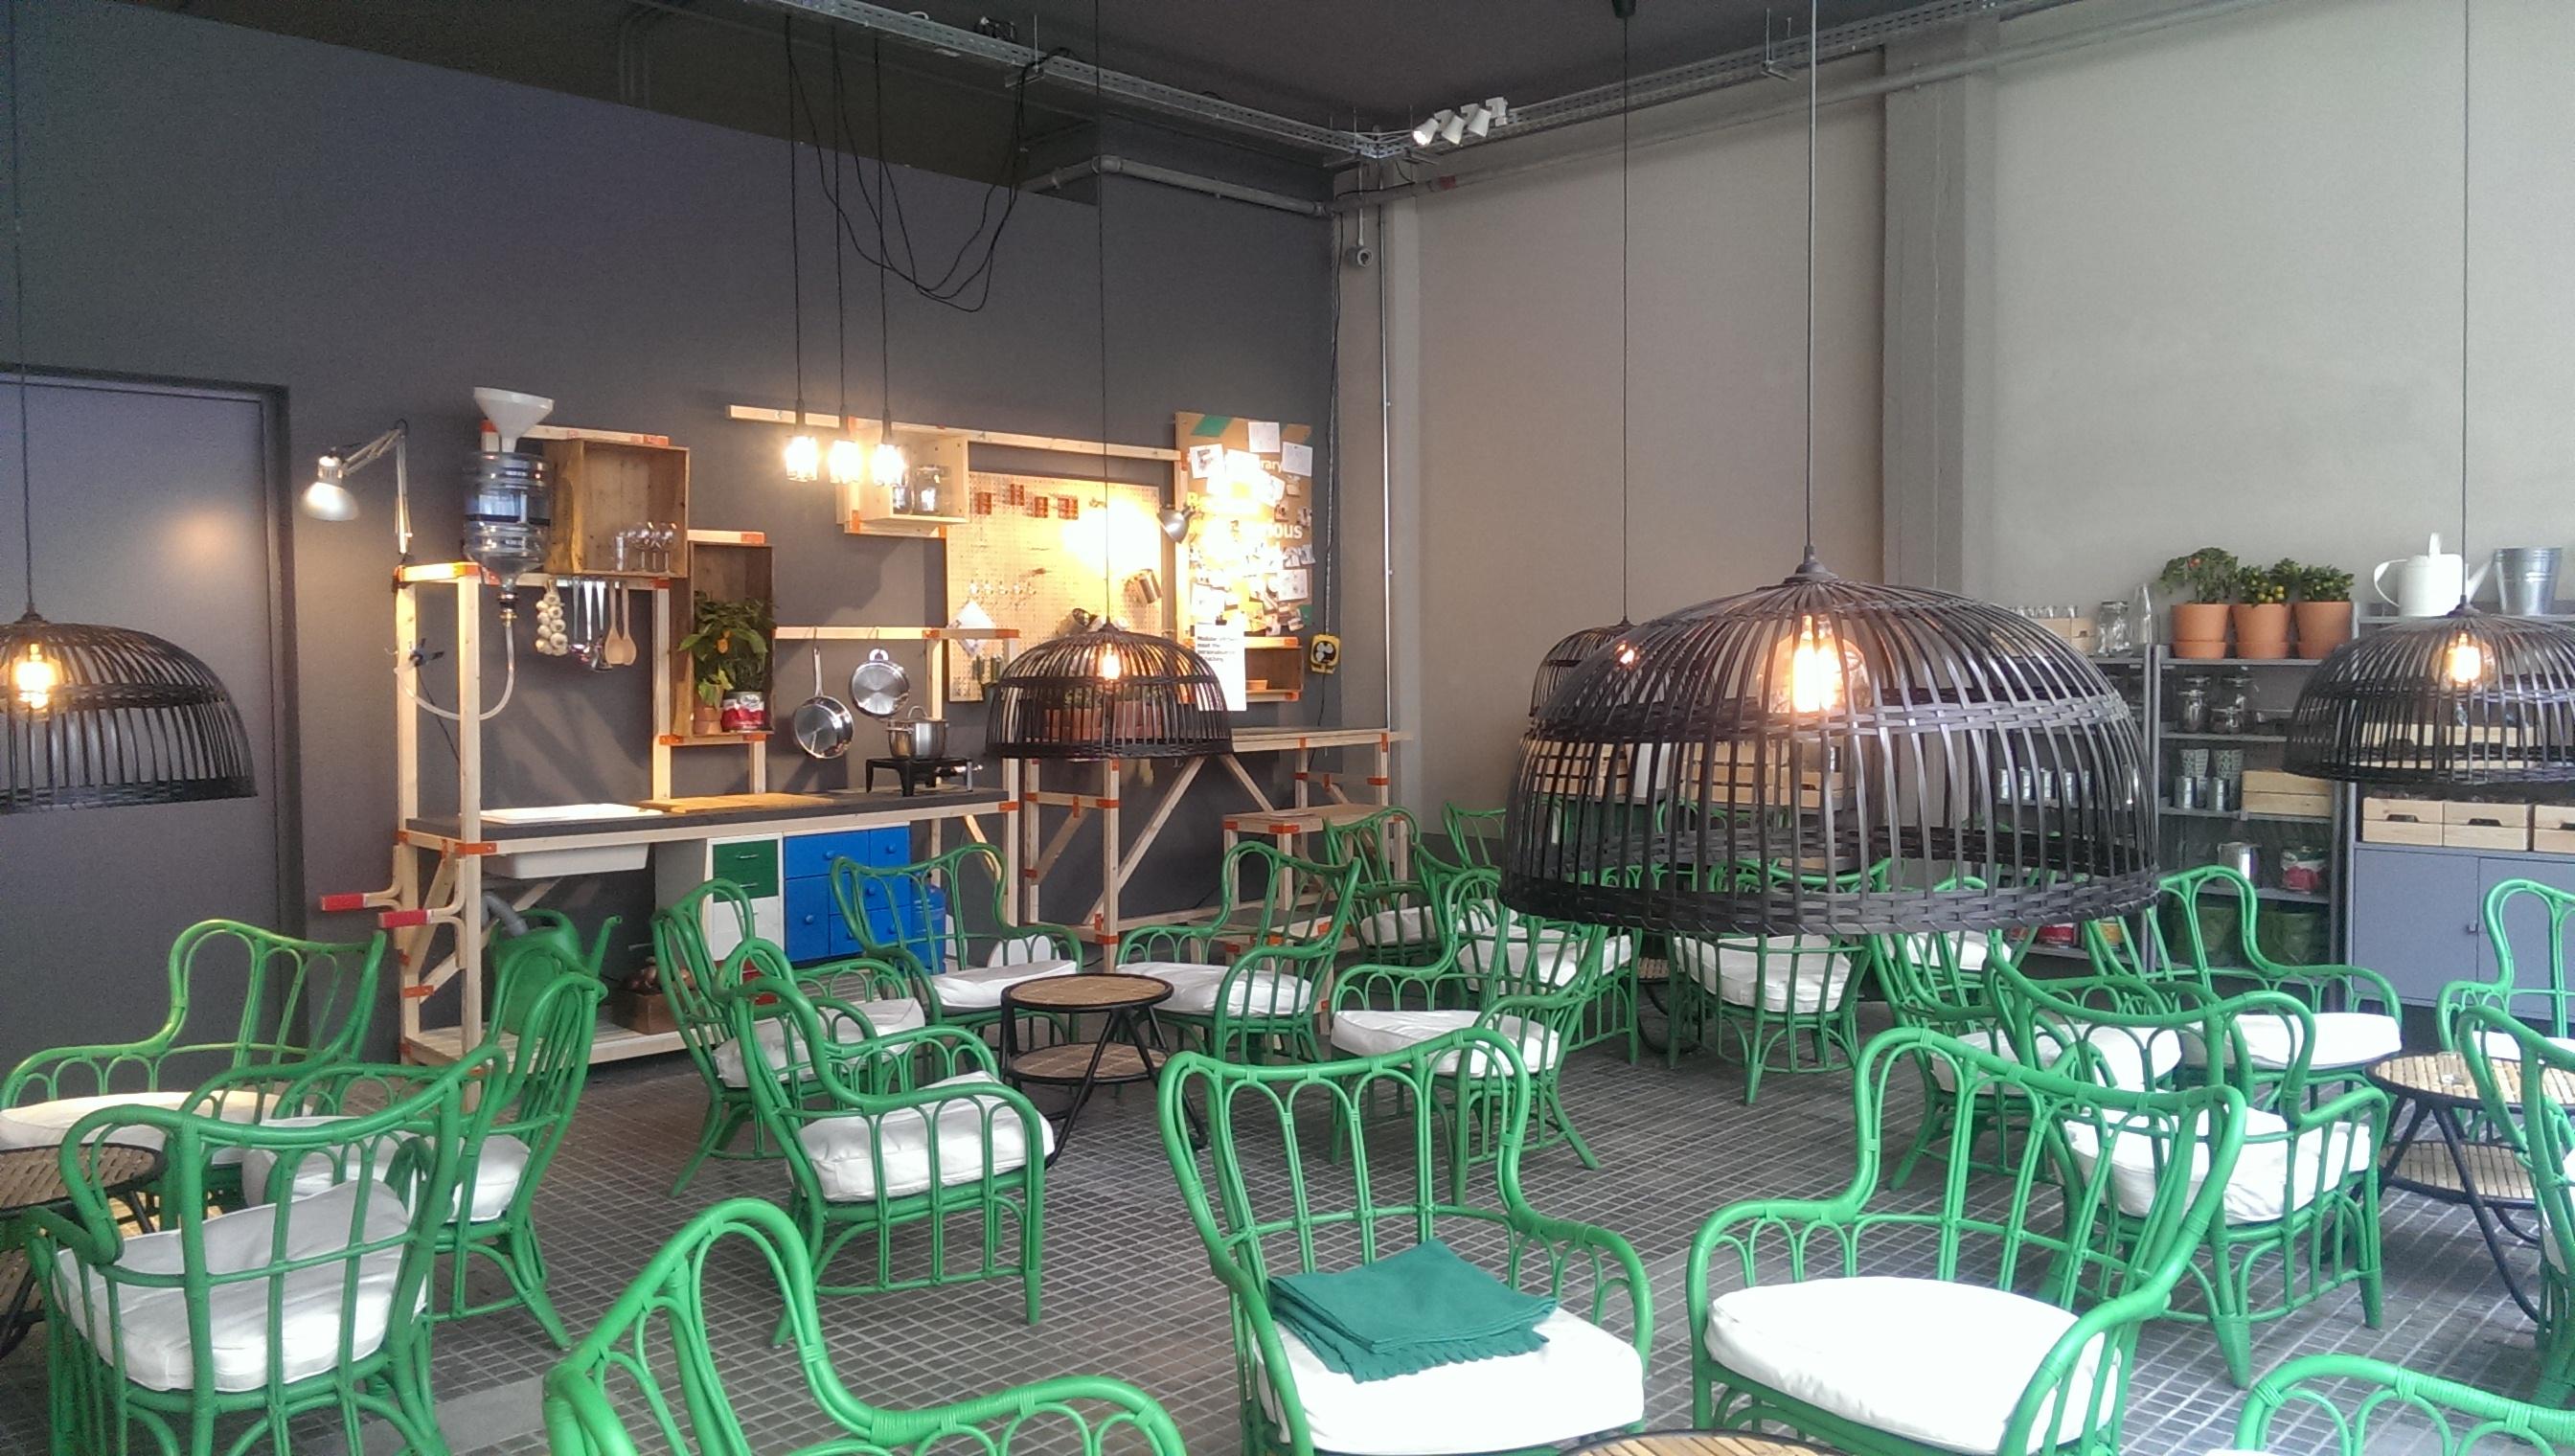 Ikea temporary store Via Vigevano Milano Iglooo Fuorisalone - IGLOOO